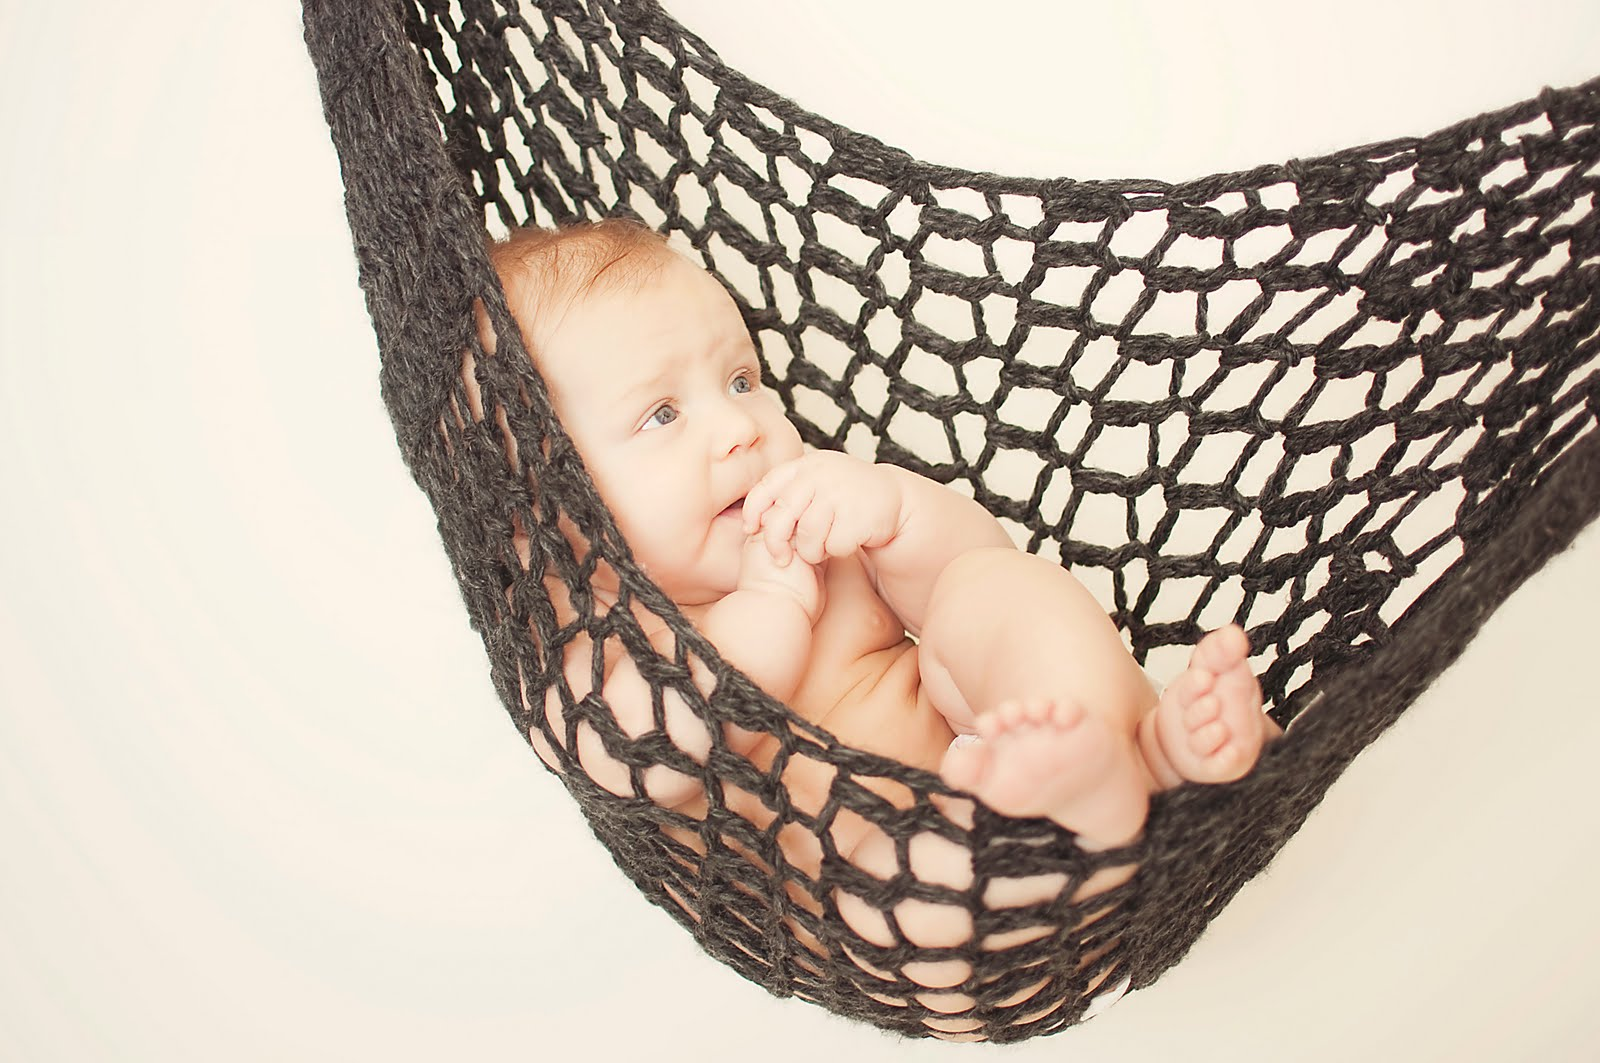 Finding Crochet Hammock Patterns